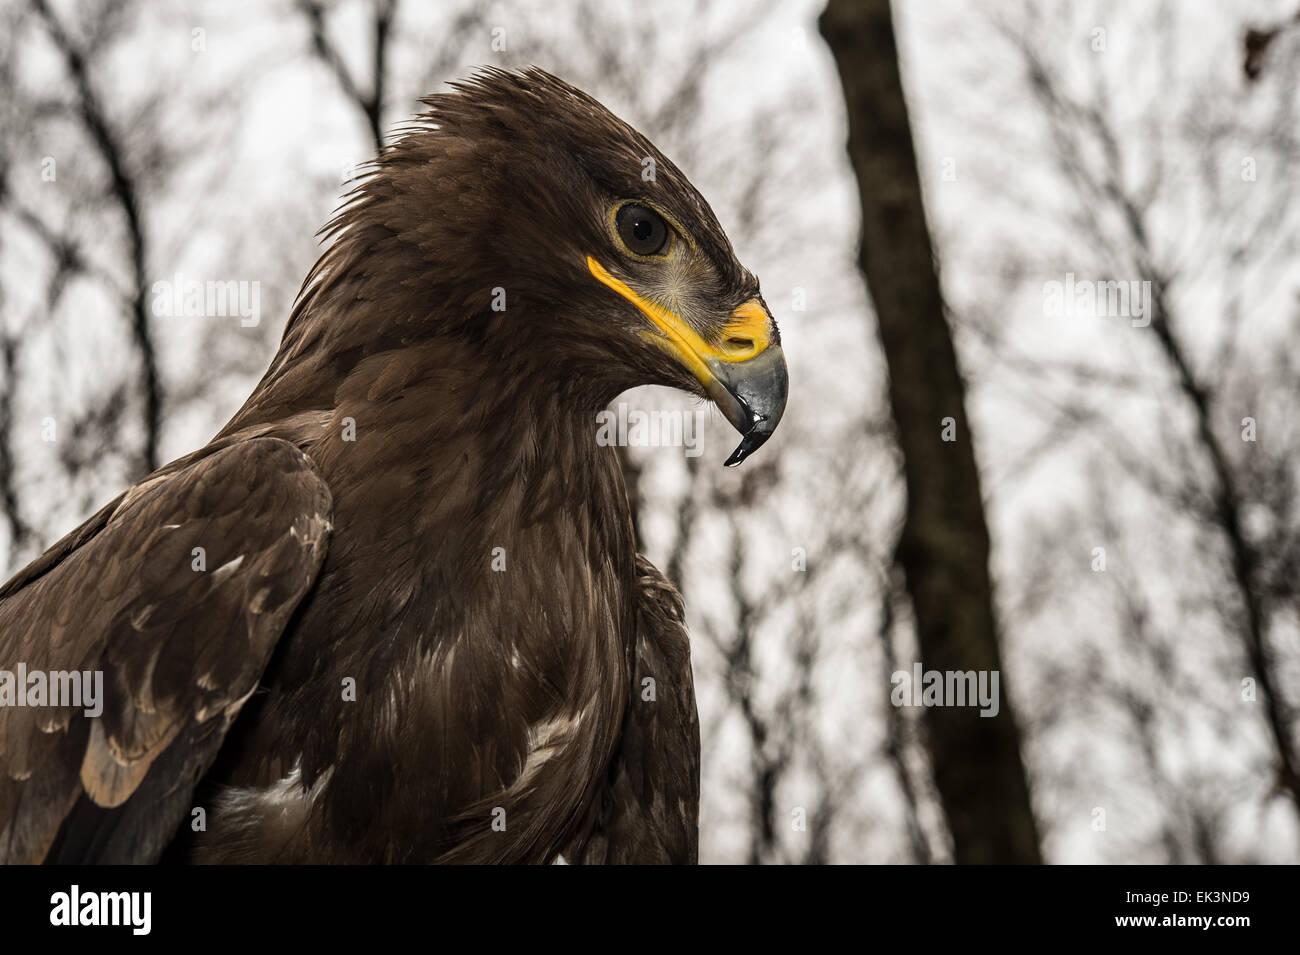 Steppe Eagle, Aquila nipalensis, Accipitridae - Stock Image